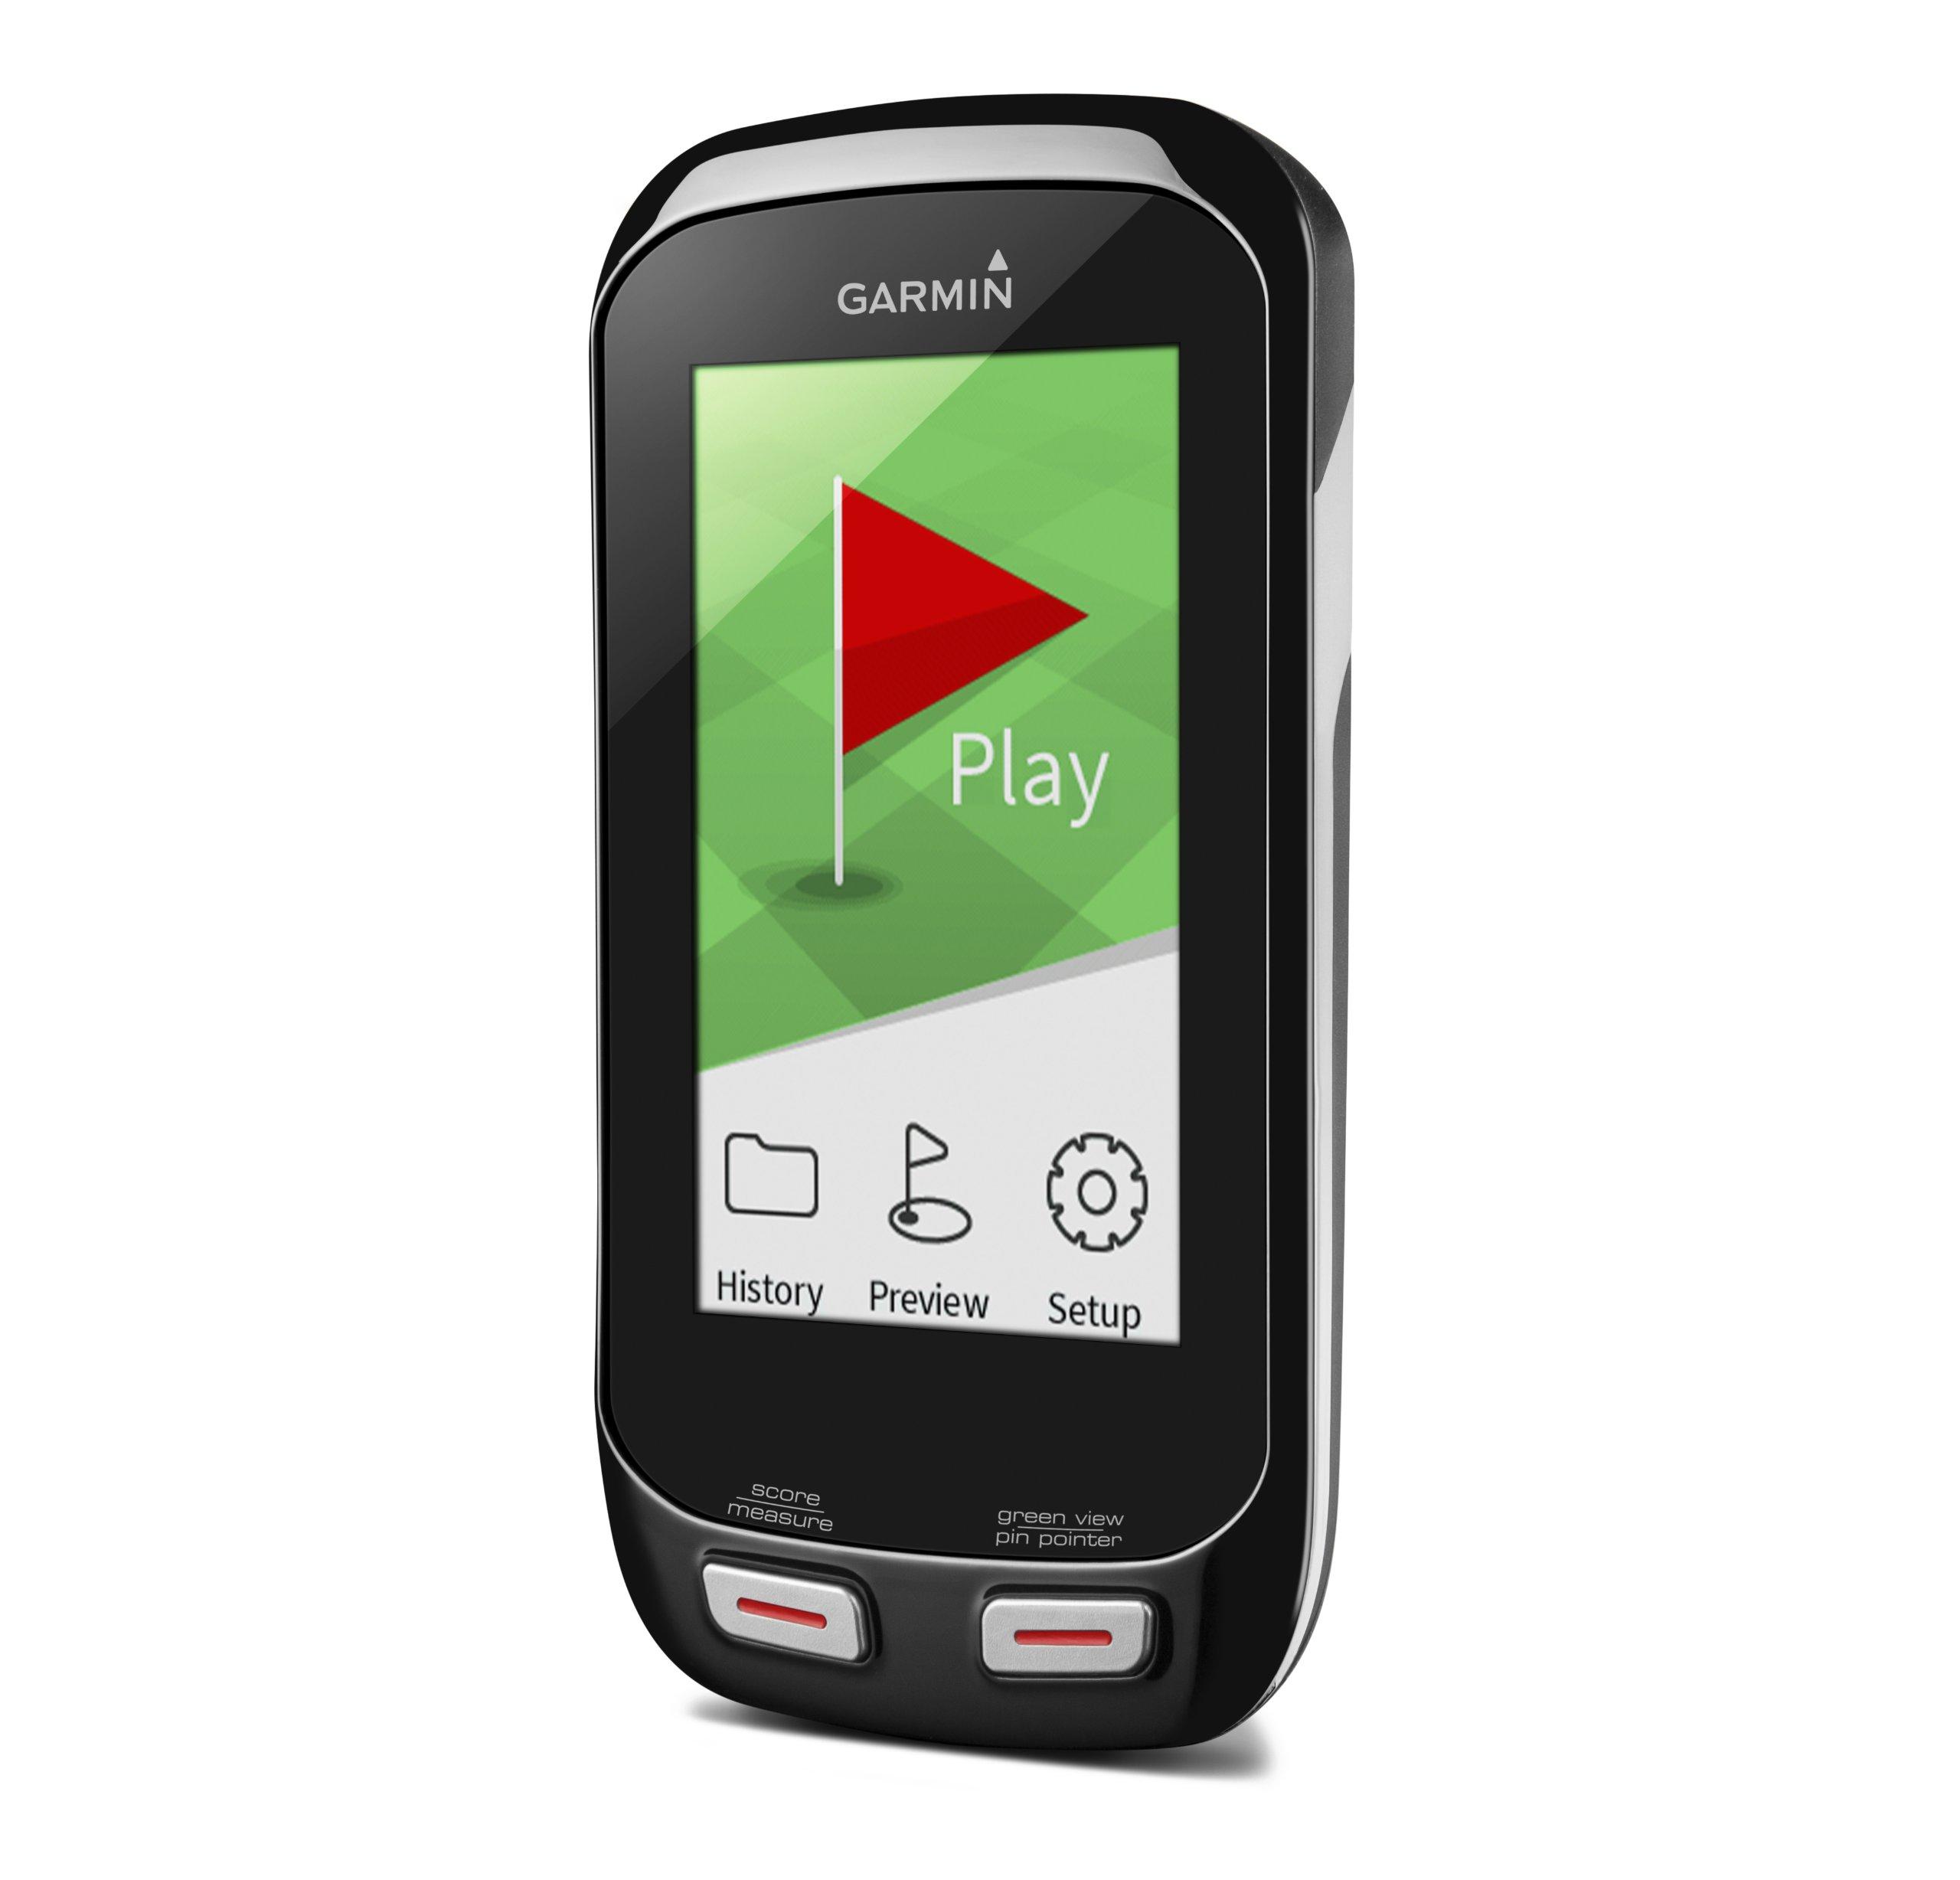 Garmin Approach Golf Course GPS